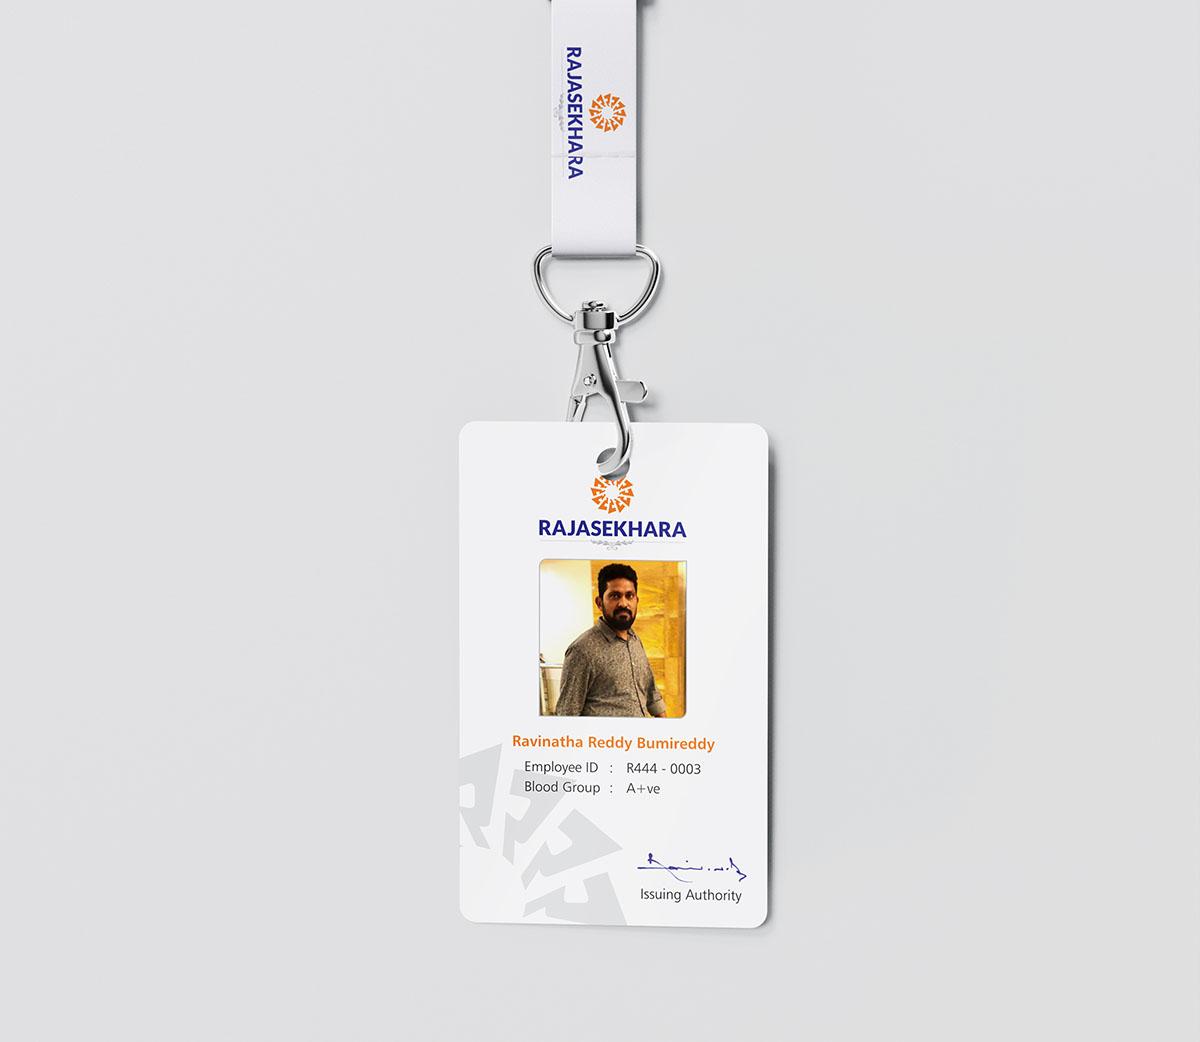 construction-company-branding-agency-hyderabad